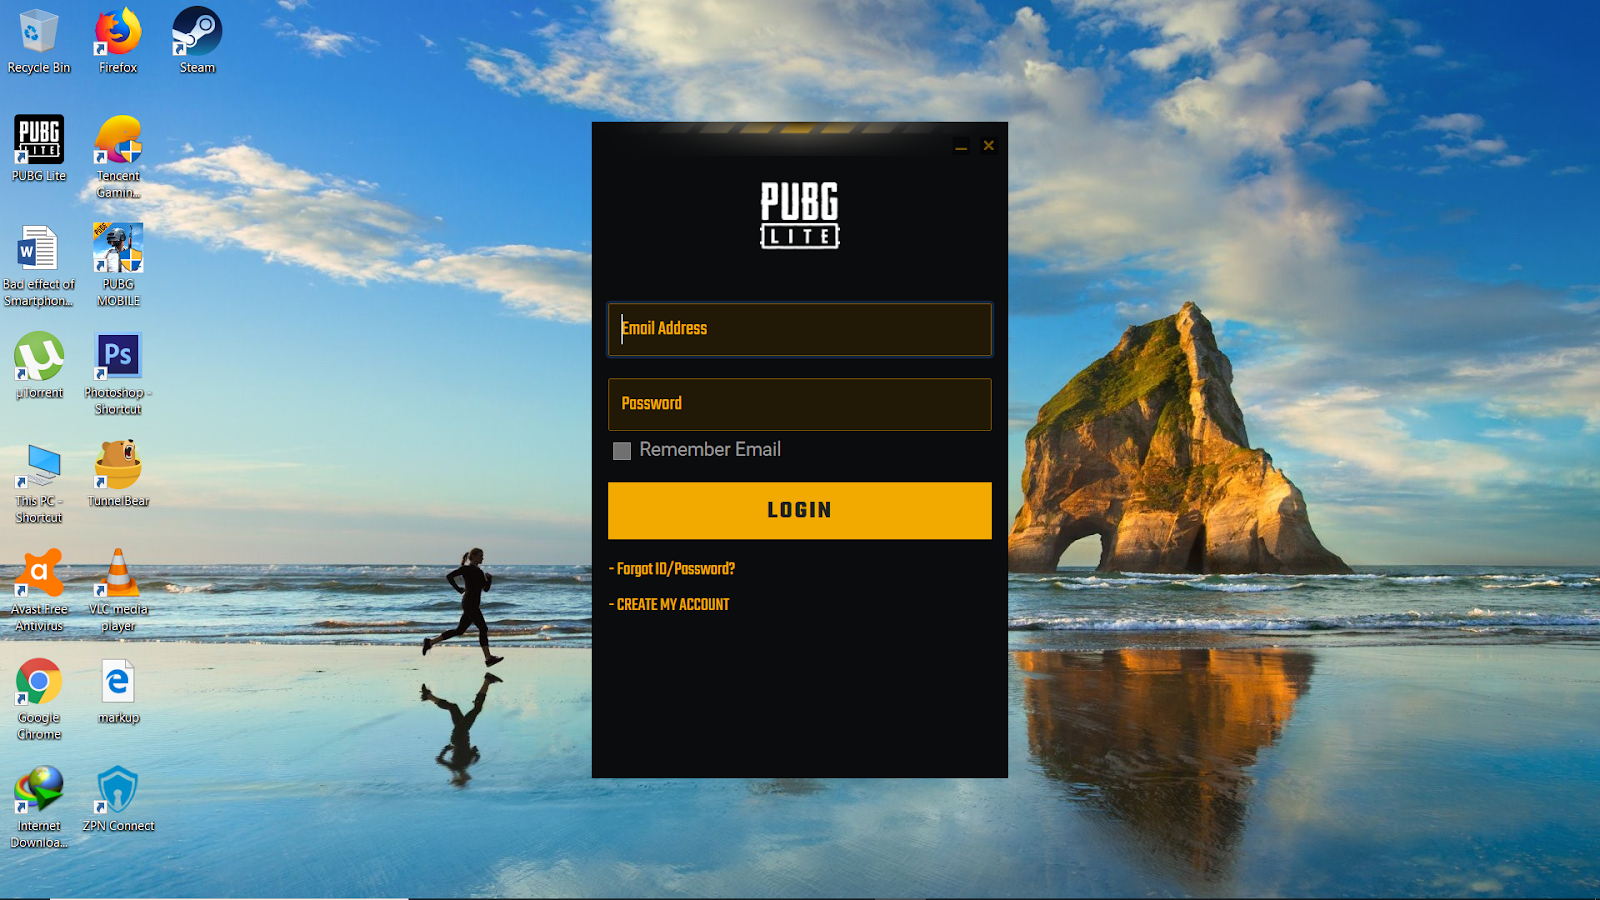 Download PUBG Lite For PC   Download PUBG LITE FREE IN 5